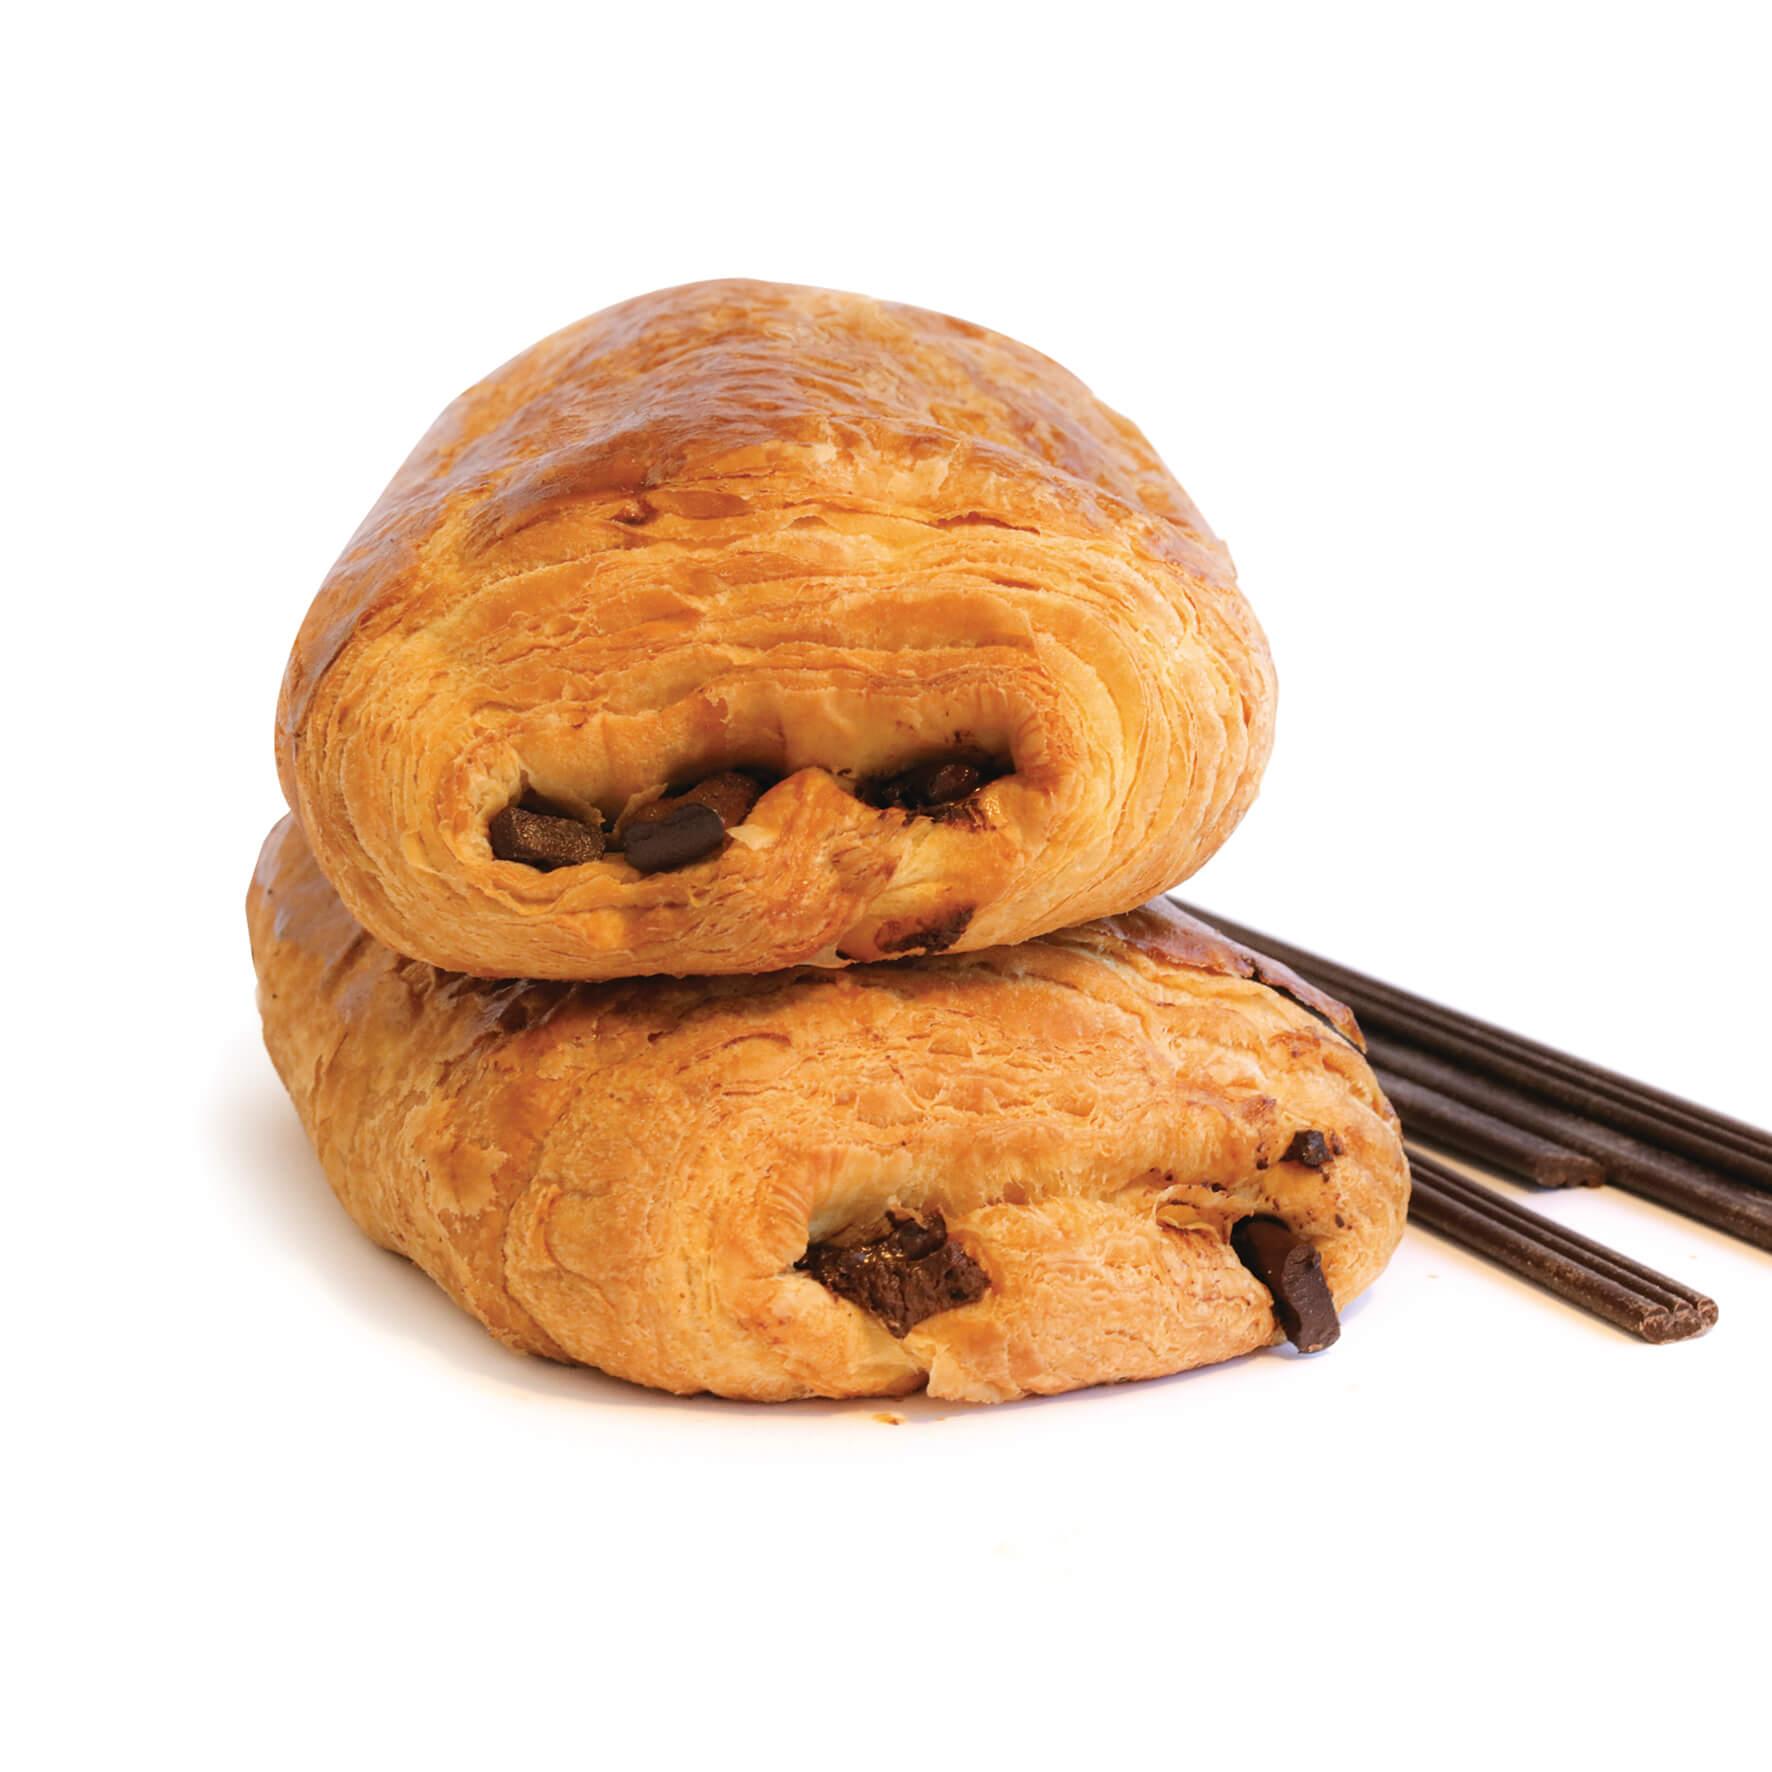 Maxi Chocholate Croissant (margarine)